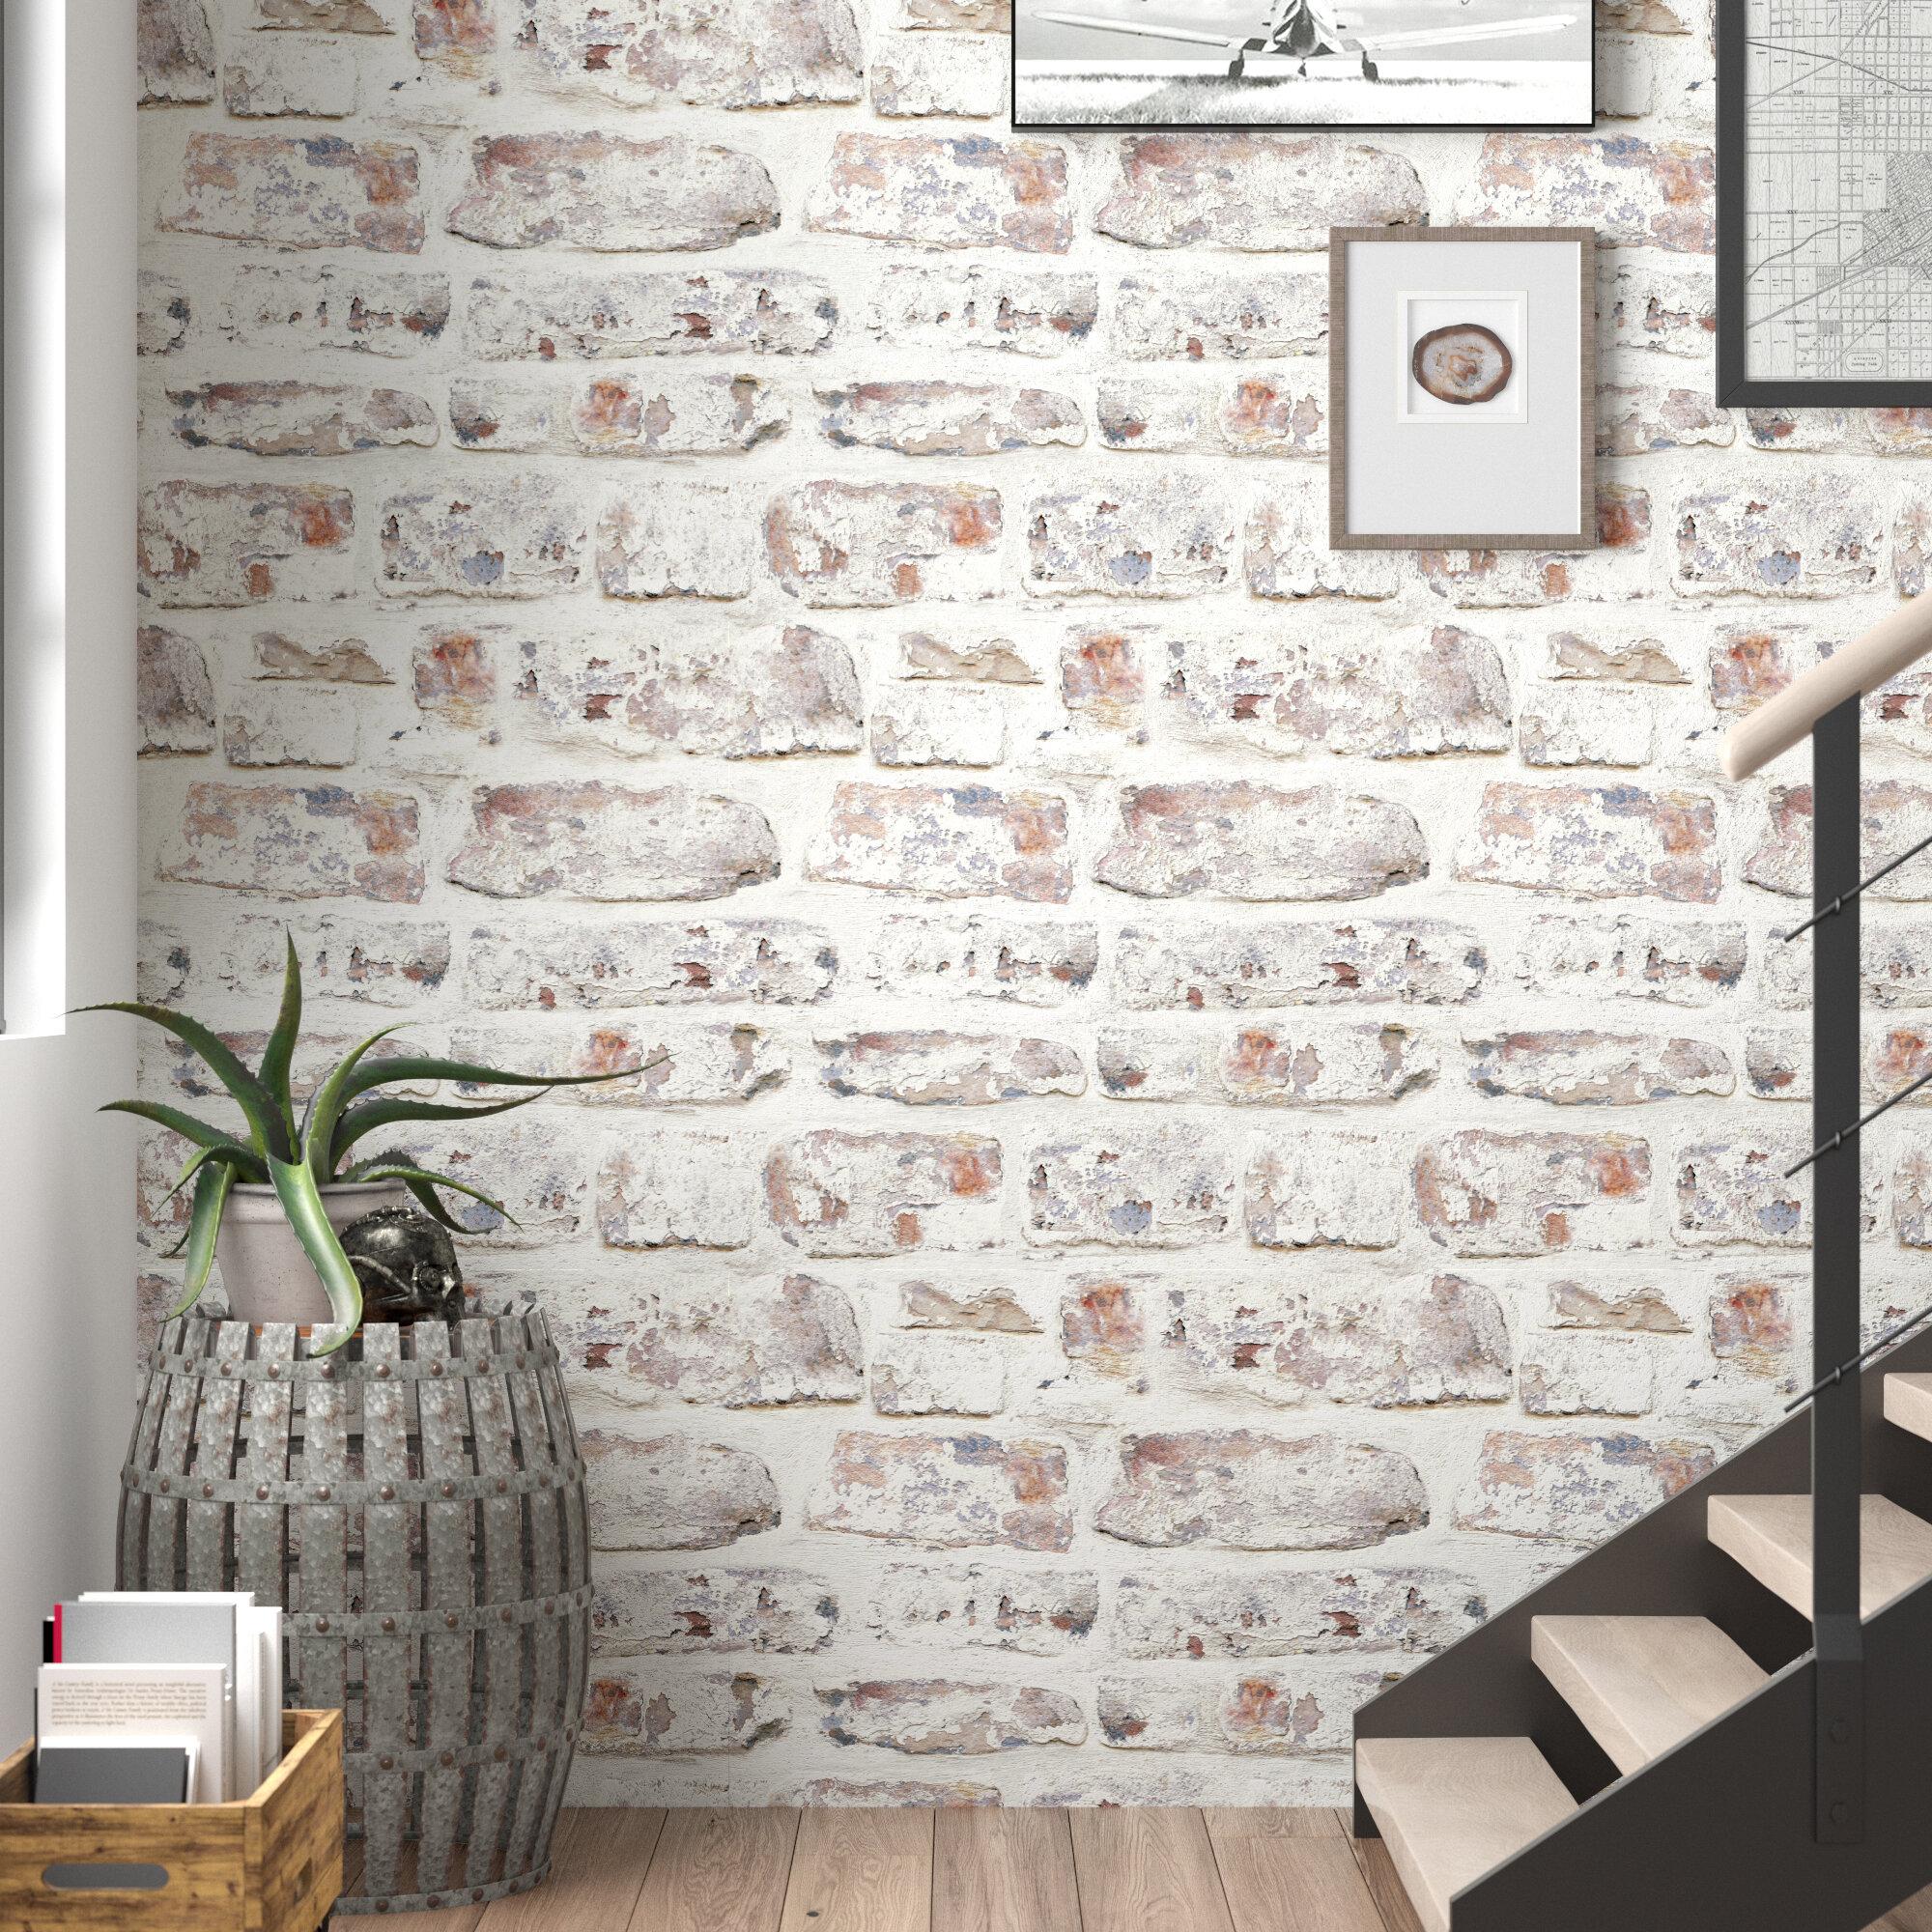 Wallpaper You Ll Love In 2021 Wayfair